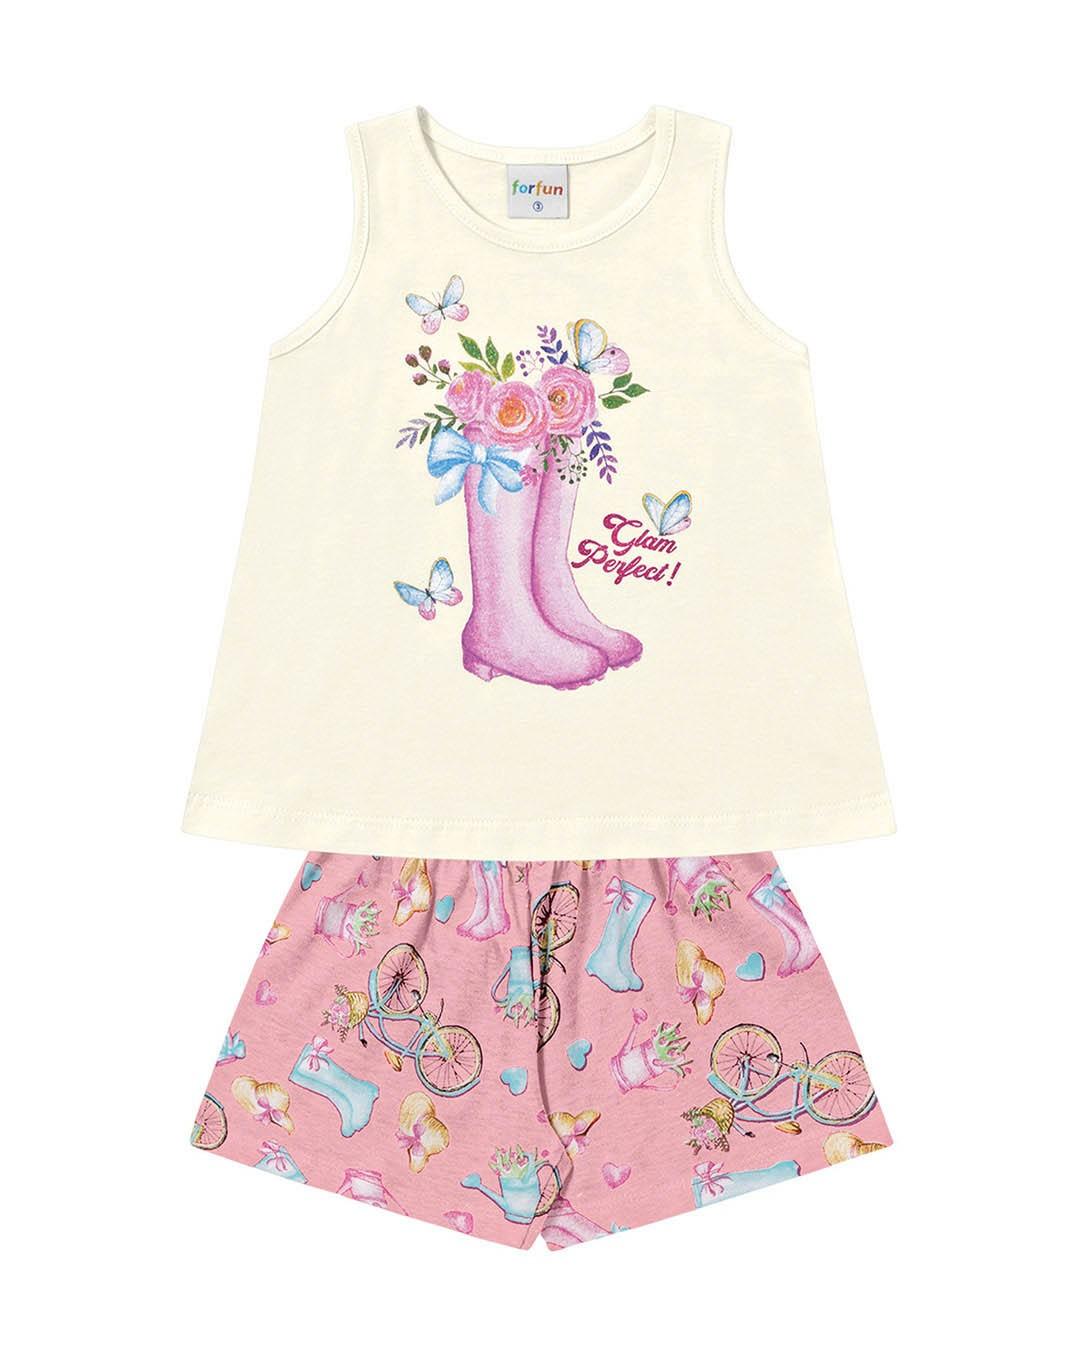 Conjunto Infantil Botas e Rosas Off White - For Fun